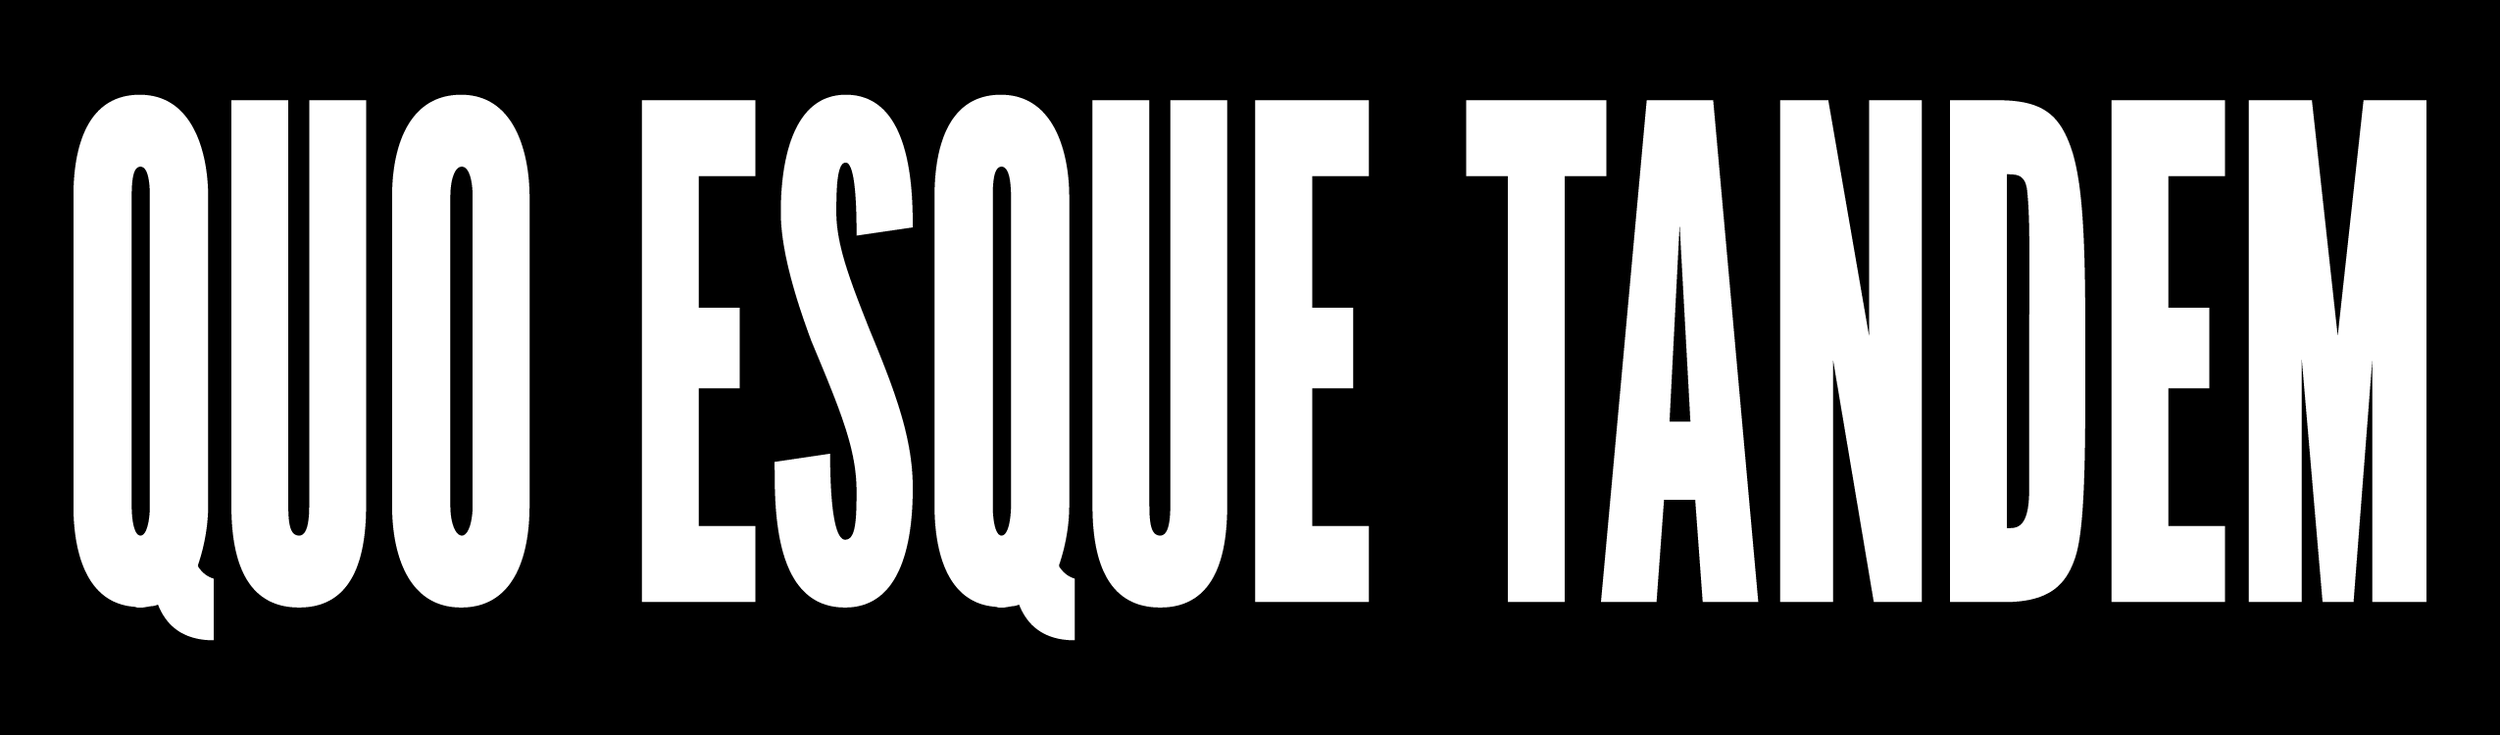 quo-esque-01.png